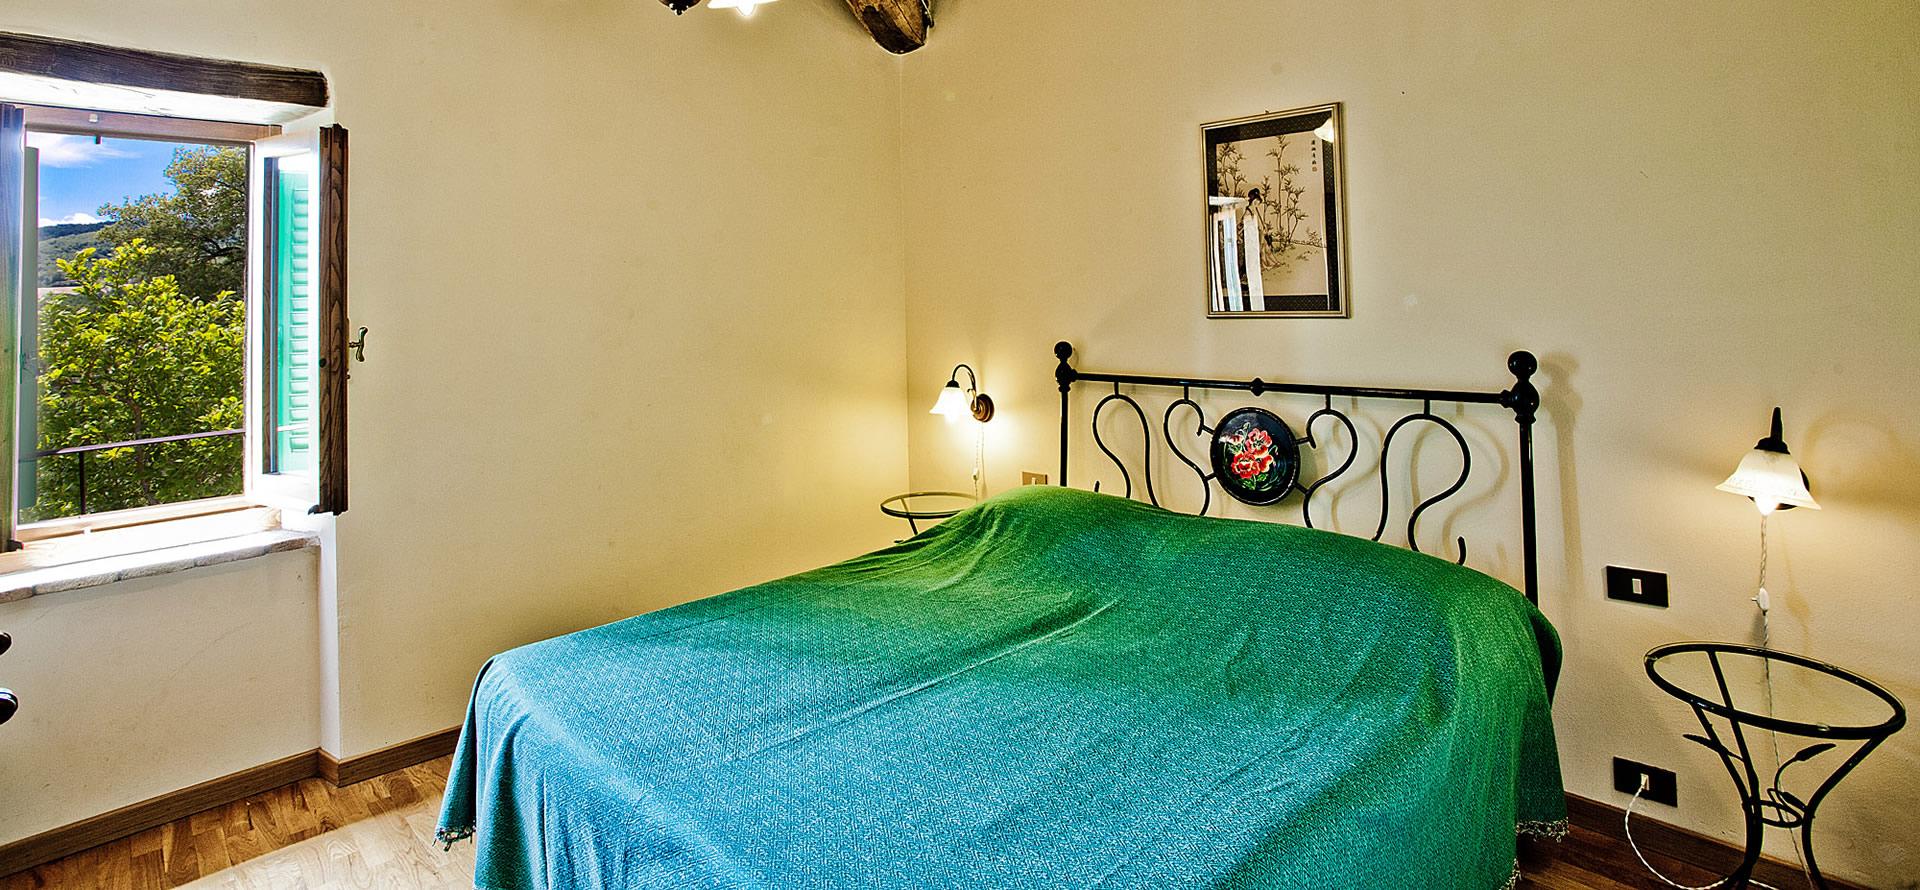 Camera matrimoniale appartamento Casina in Toscana